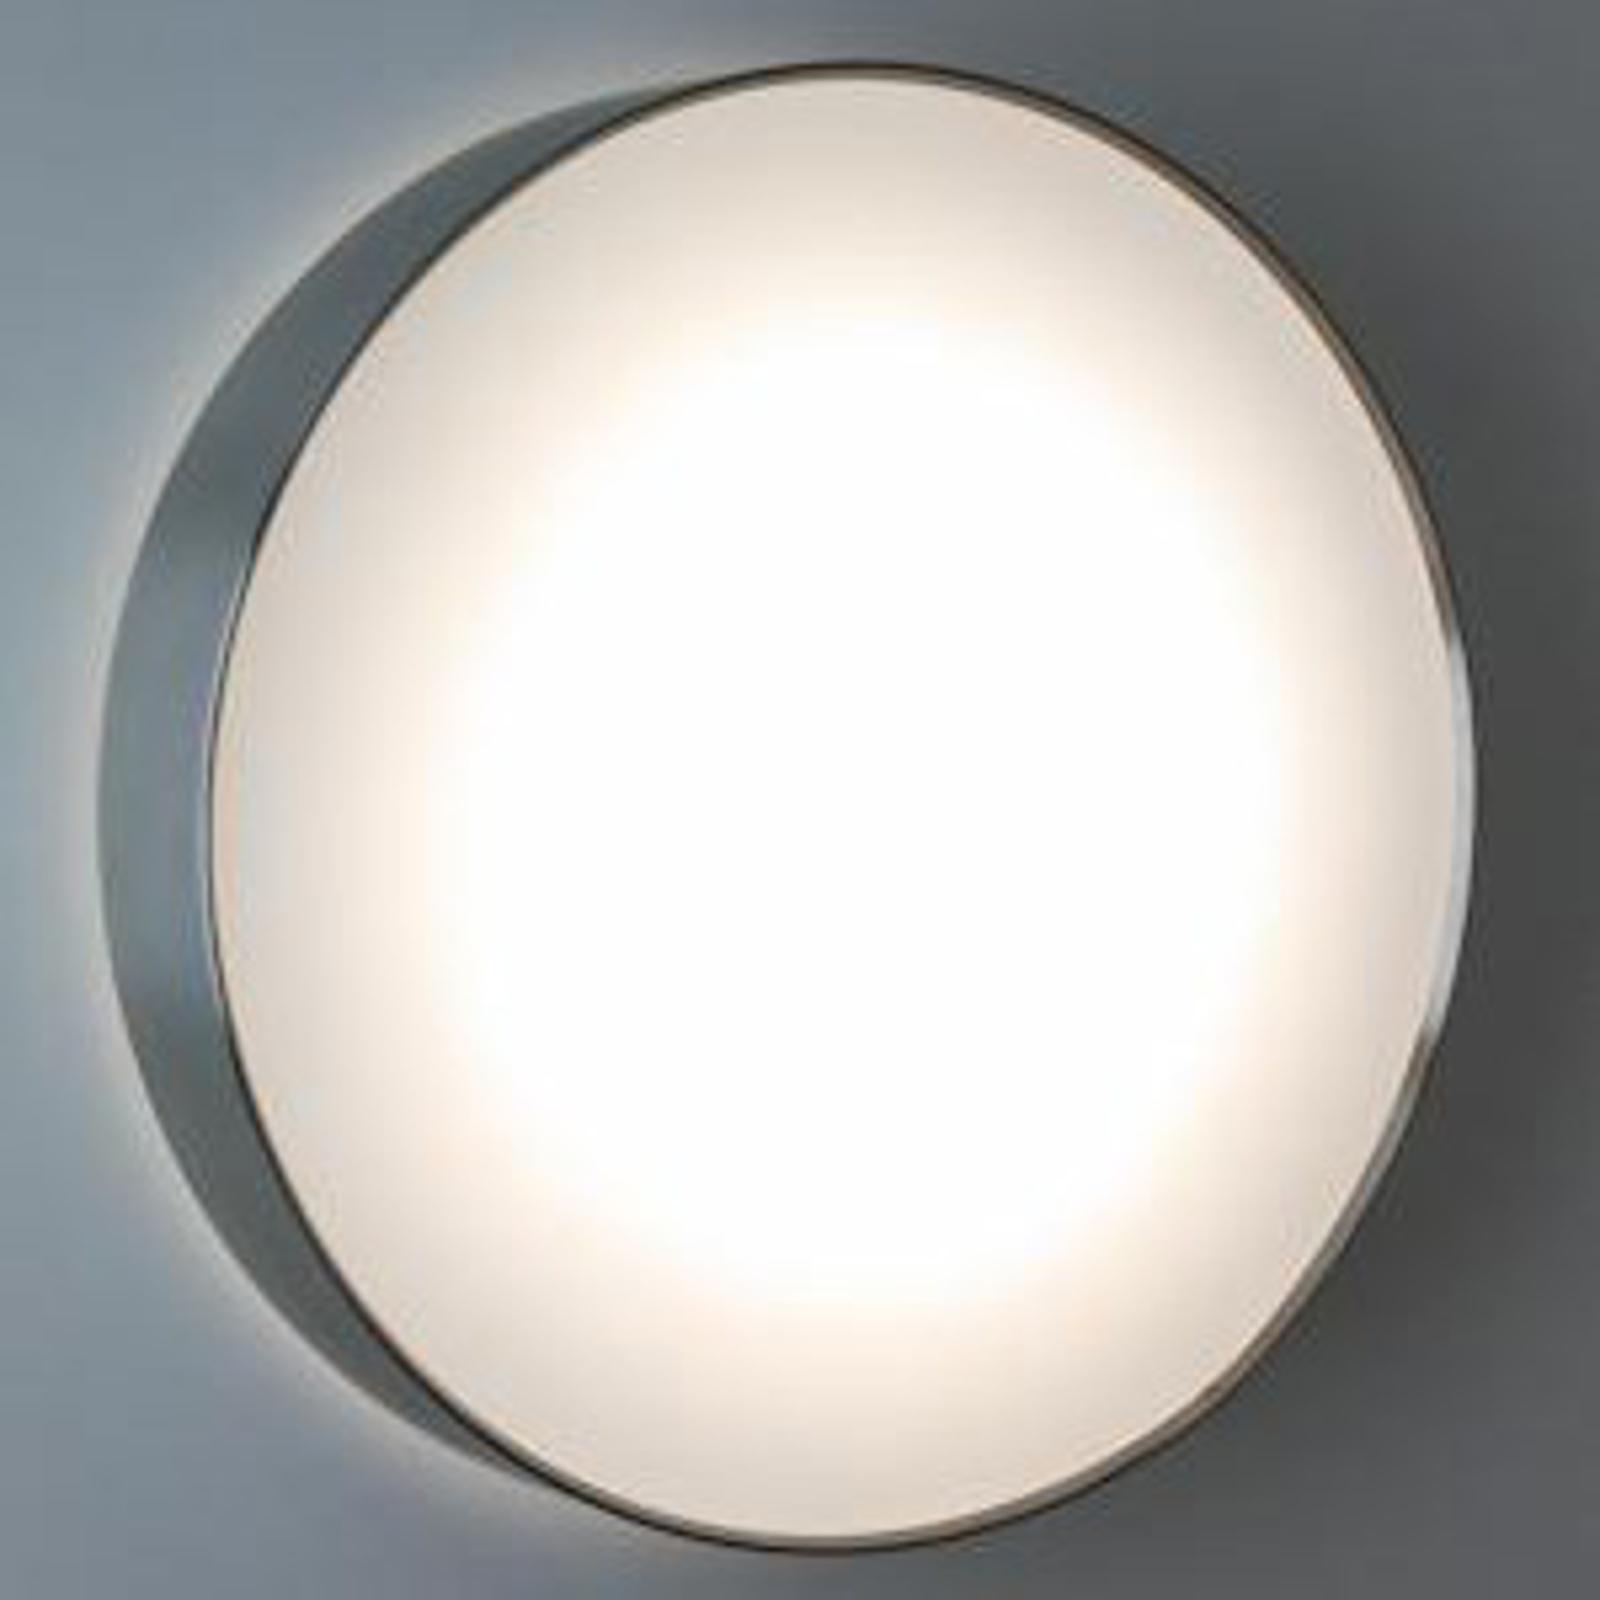 Sensor LED roestvrijstalen lamp SUN 4, 13 W